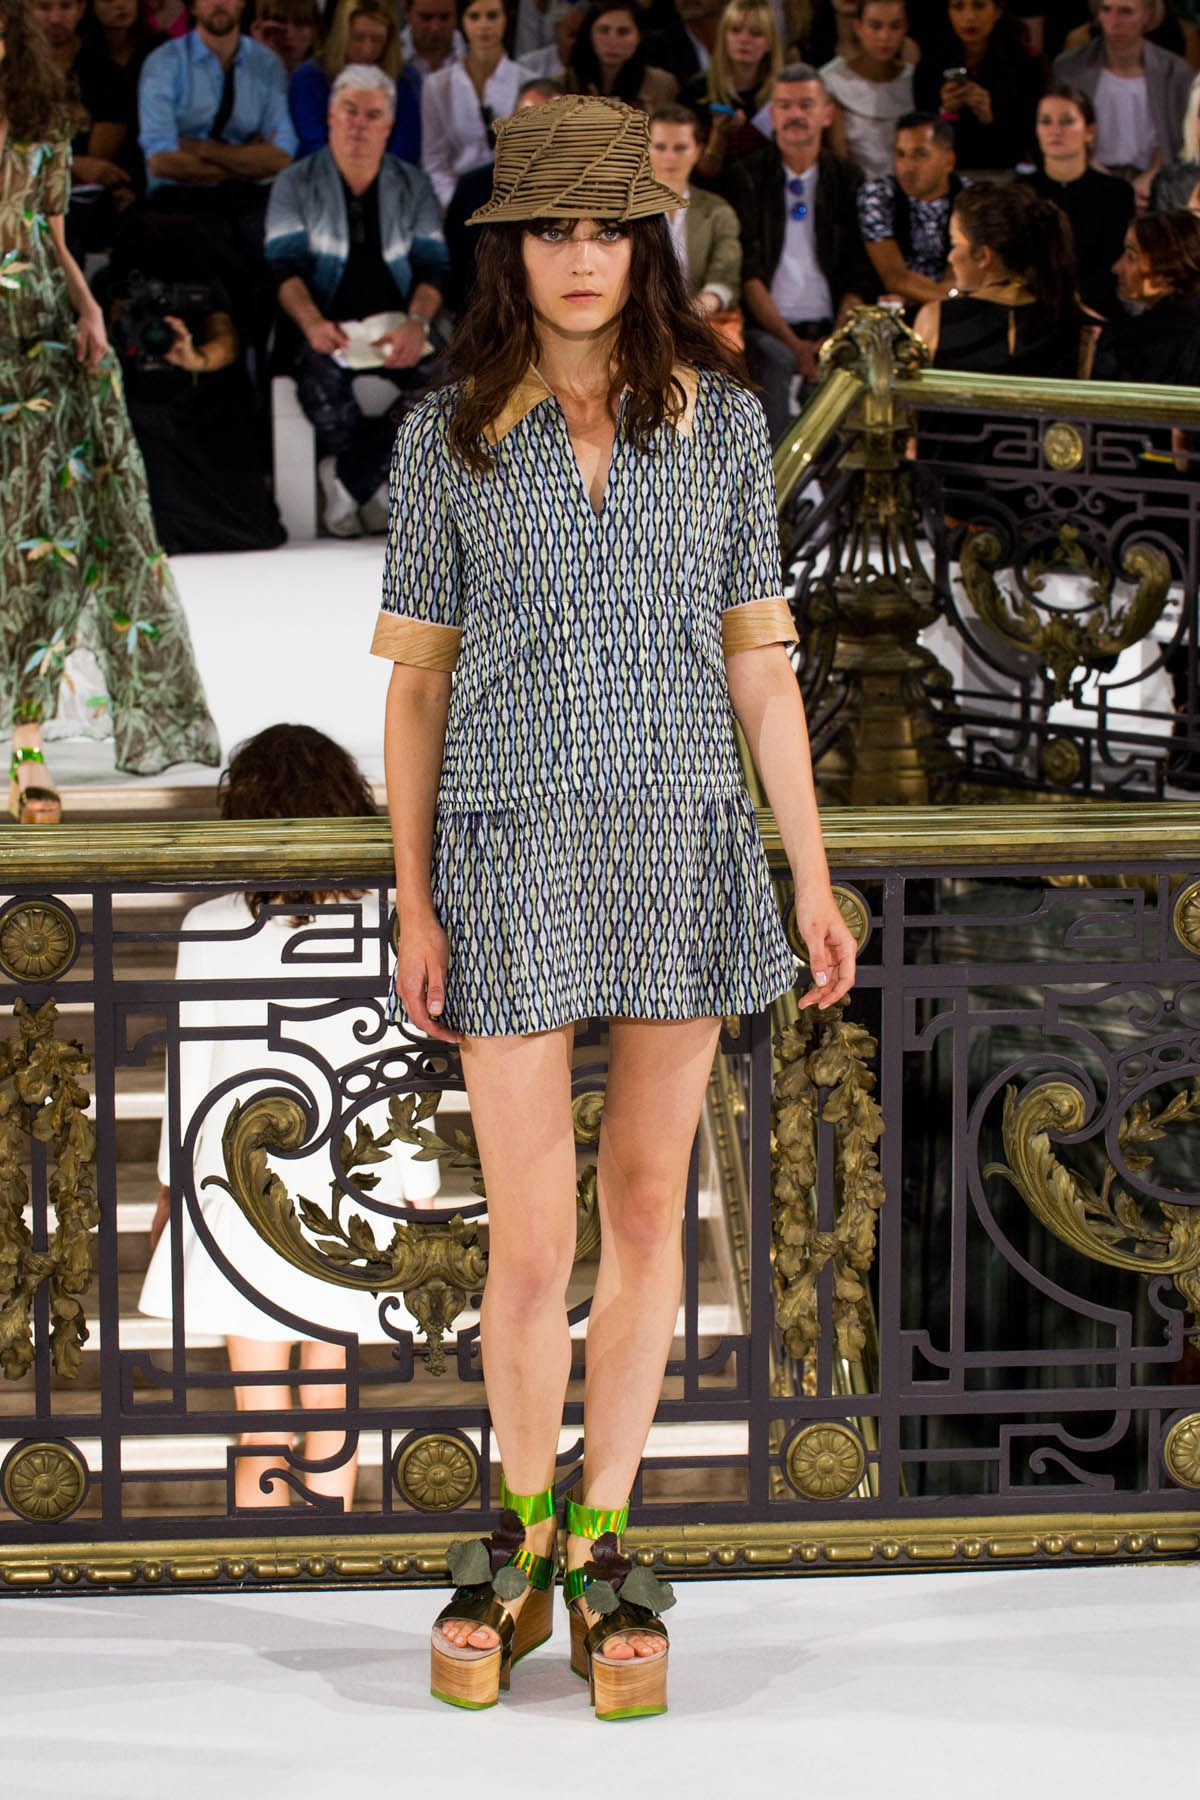 John Galliano | Paris | Verão 2015 RTW